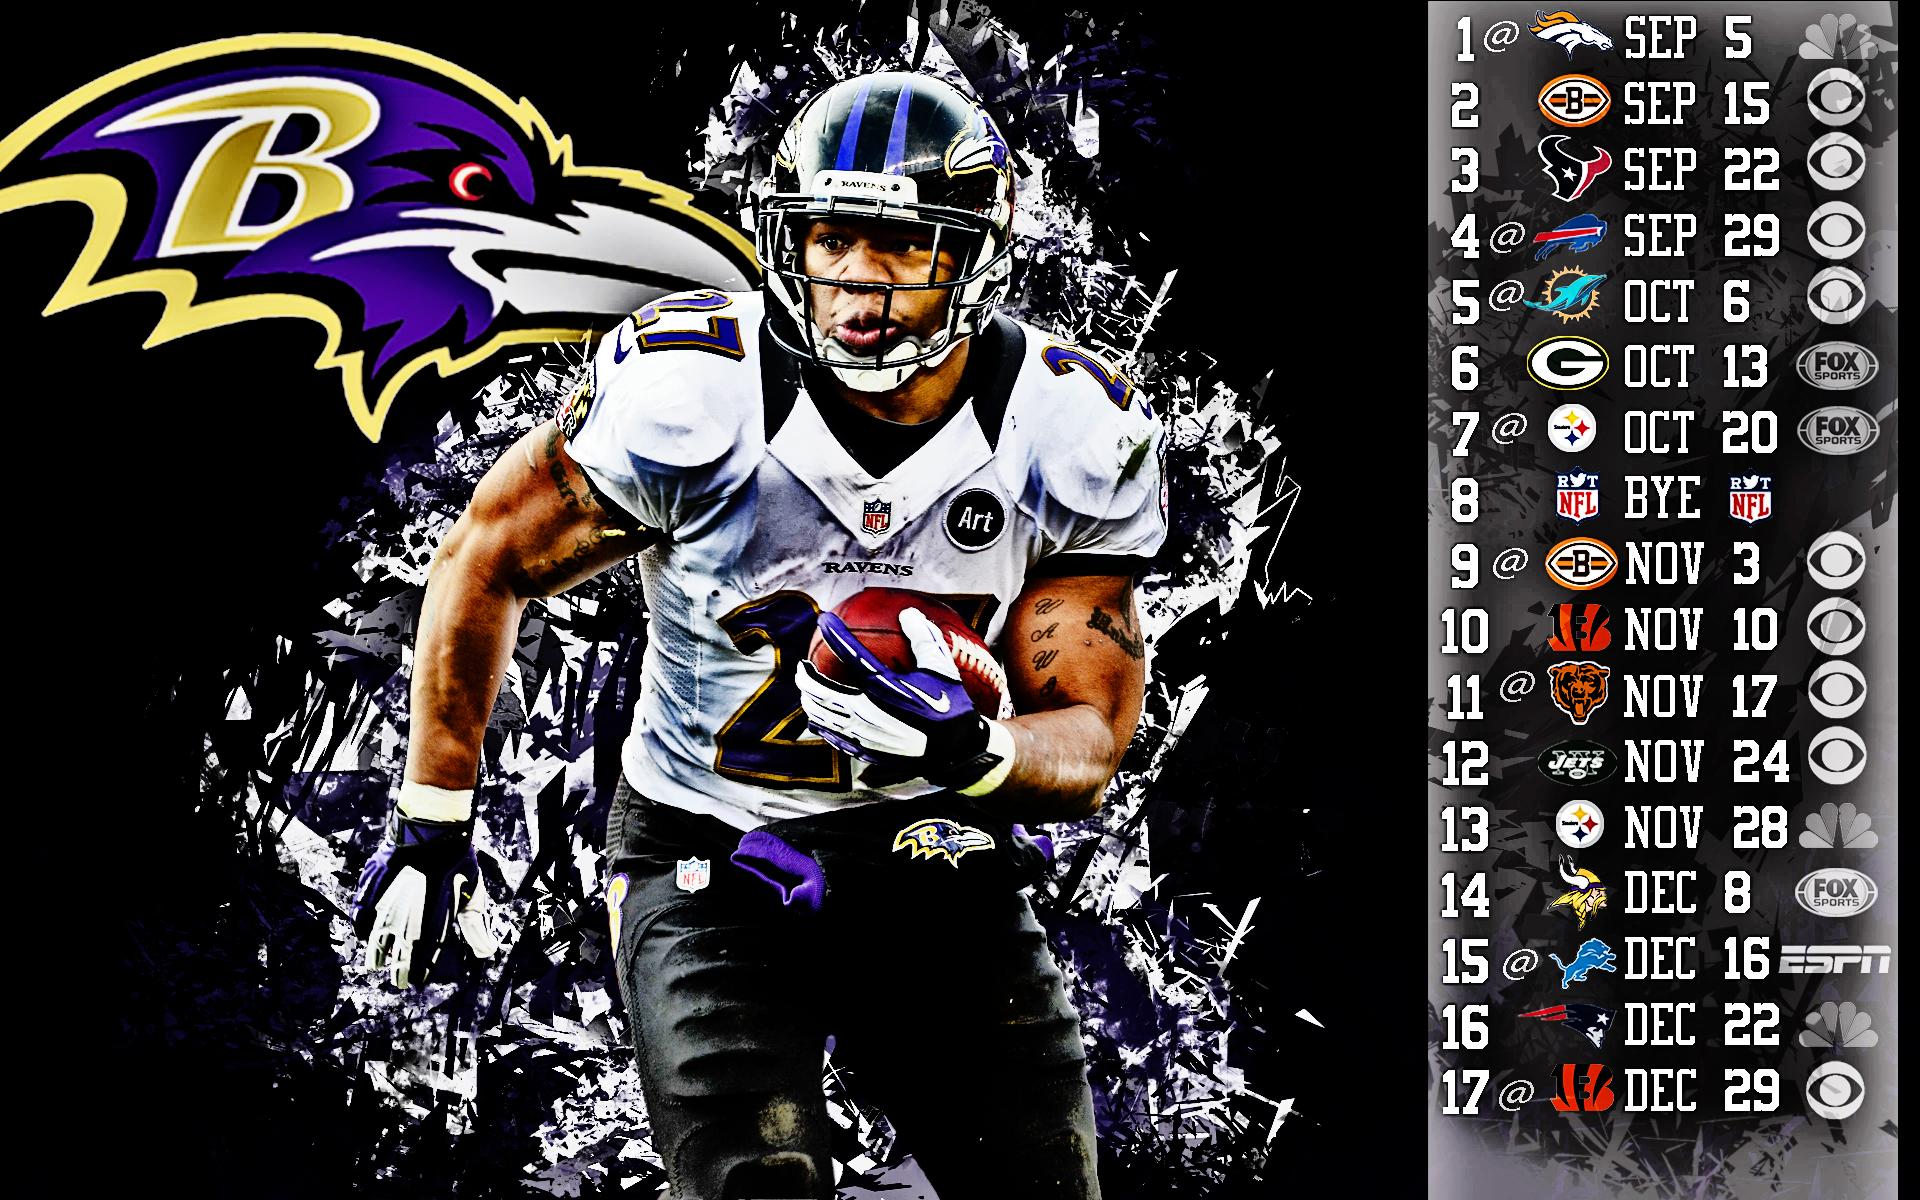 2013 Baltimore Ravens football nfl wallpaper background 1920x1200